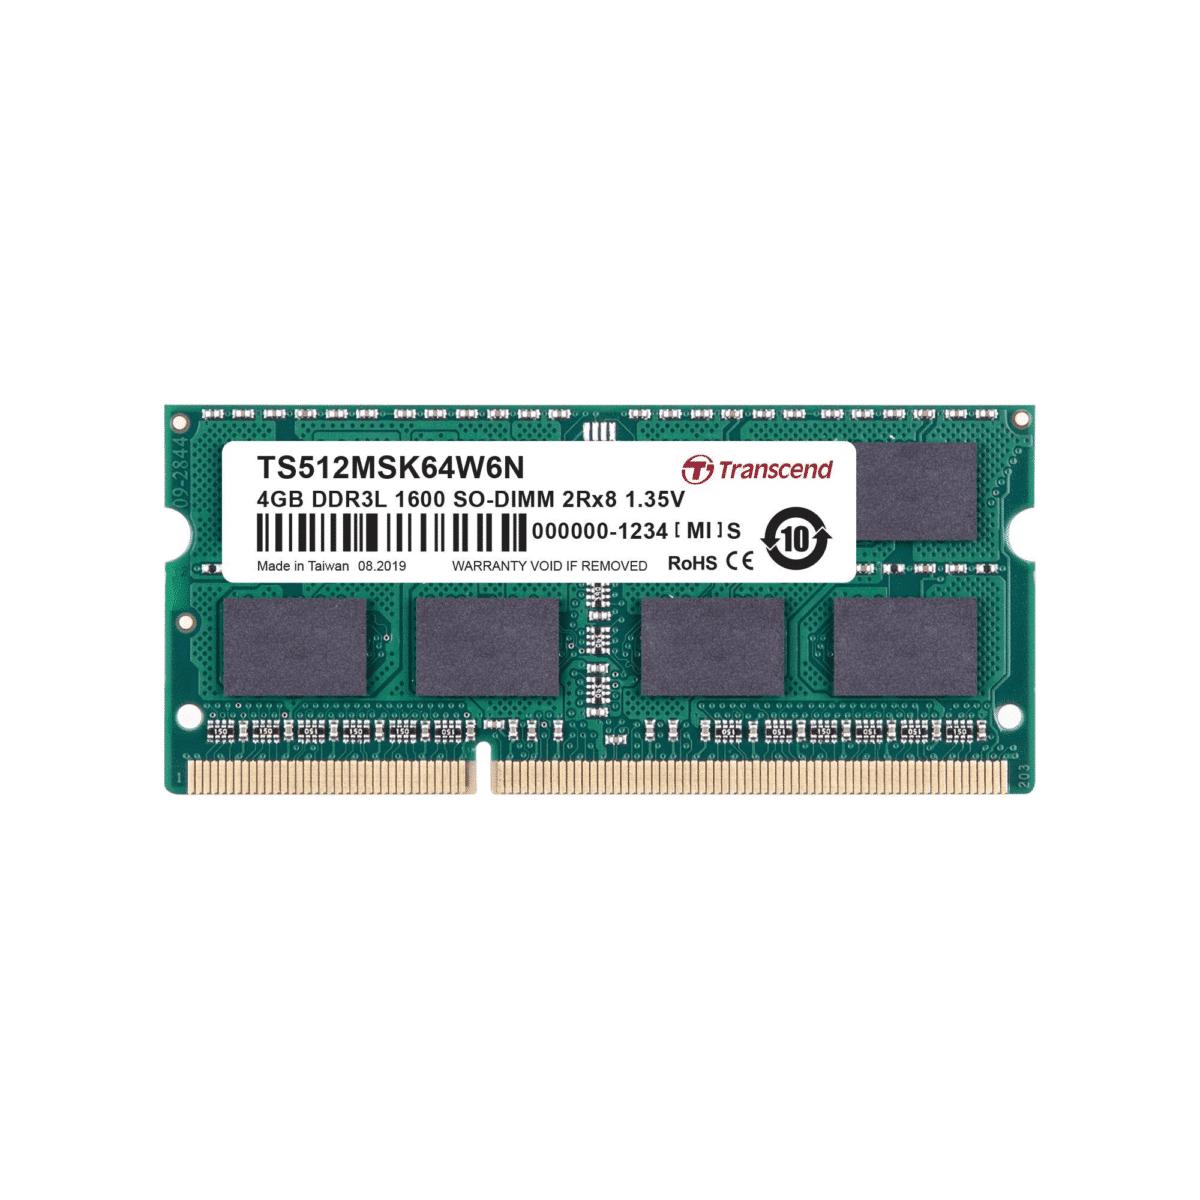 Transcend DDR3-1600 SO-DIMM 4GB TS512MSK64W6N